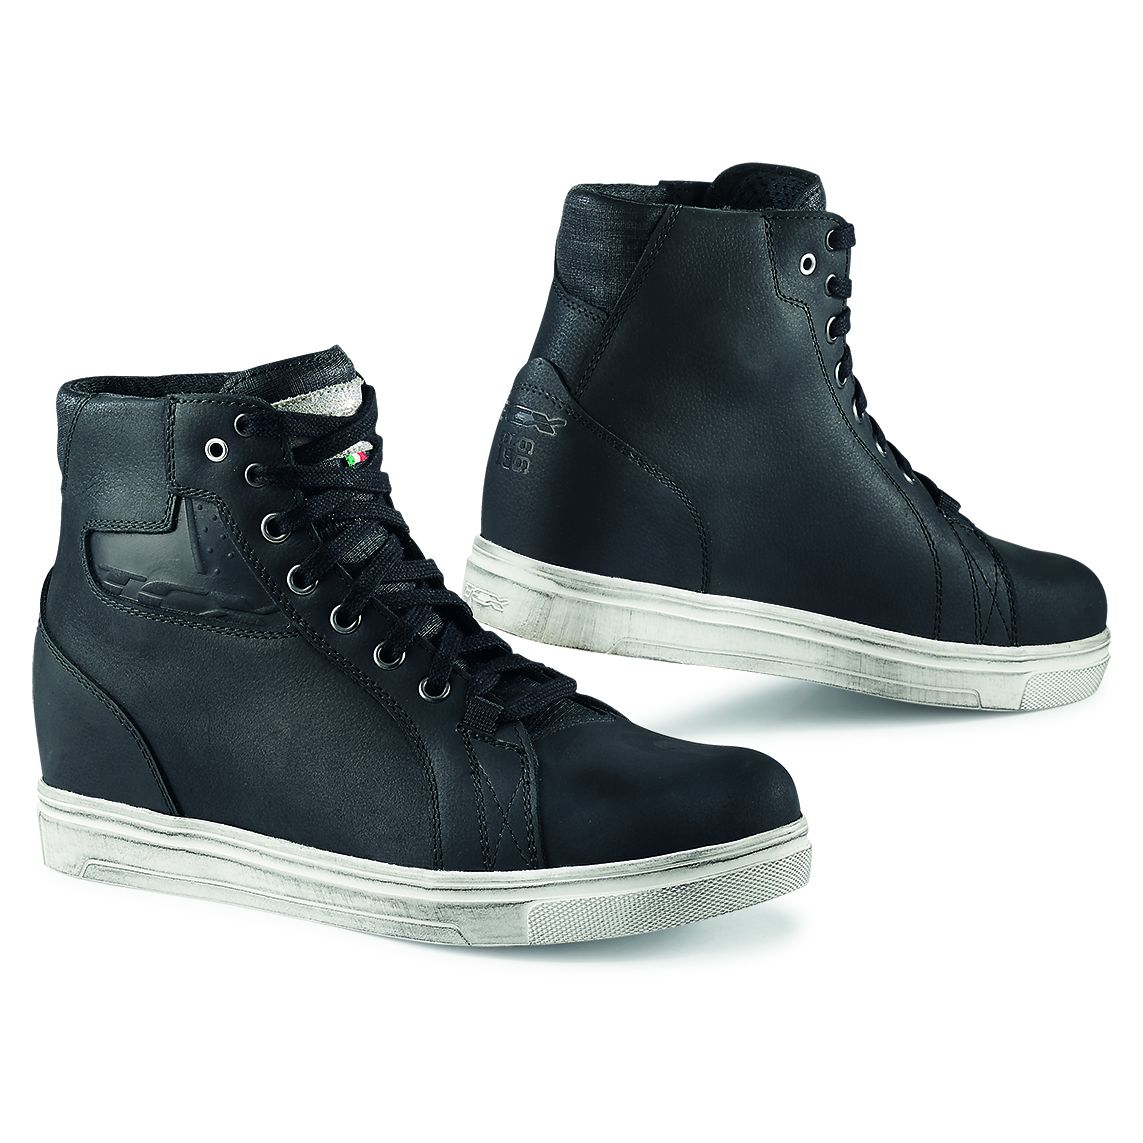 Chaussures TCX Boots STREET ACE LADY NOIR WATERPROOF